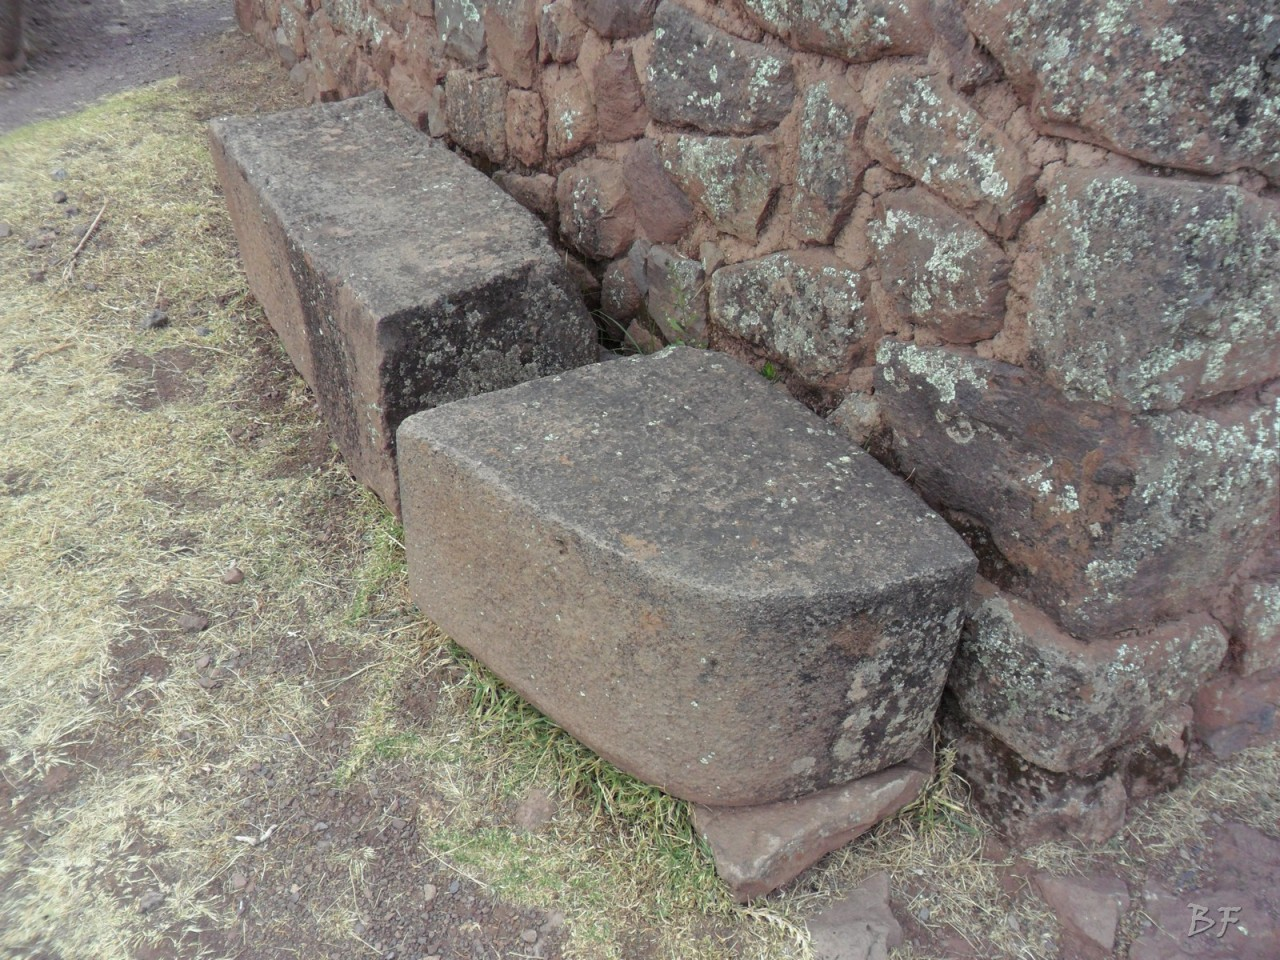 Mura-Poligonali-Megaliti-Altari-Rupestri-Pisac-Cusco-Perù-47